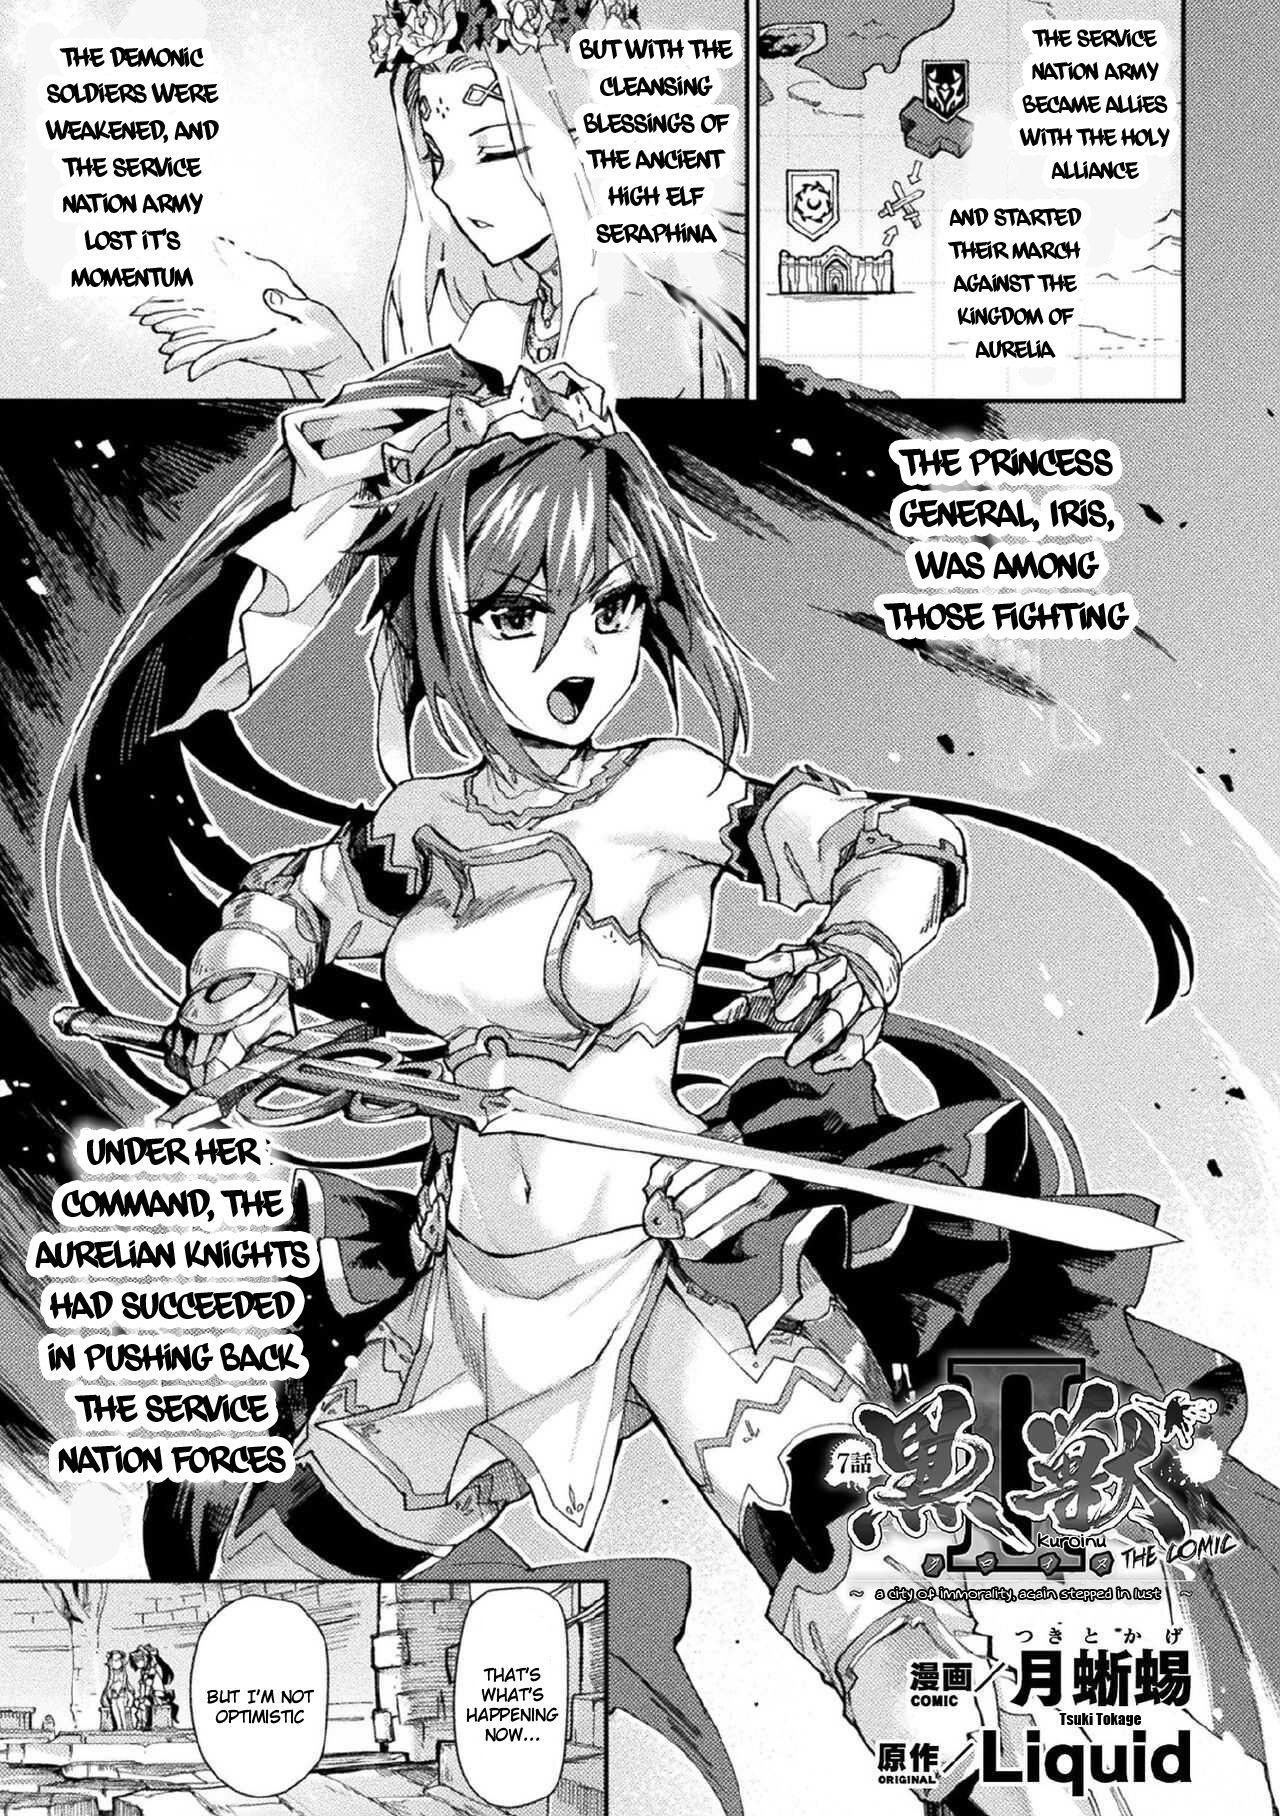 [Tsukitokage] Kuroinu II ~Inyoku ni Somaru Haitoku no Miyako, Futatabi~ THE COMIC Chapter 7 (Kukkoro Heroines Vol. 9) [English] [Decensored] (Klub Kemoner) [Digital] 0